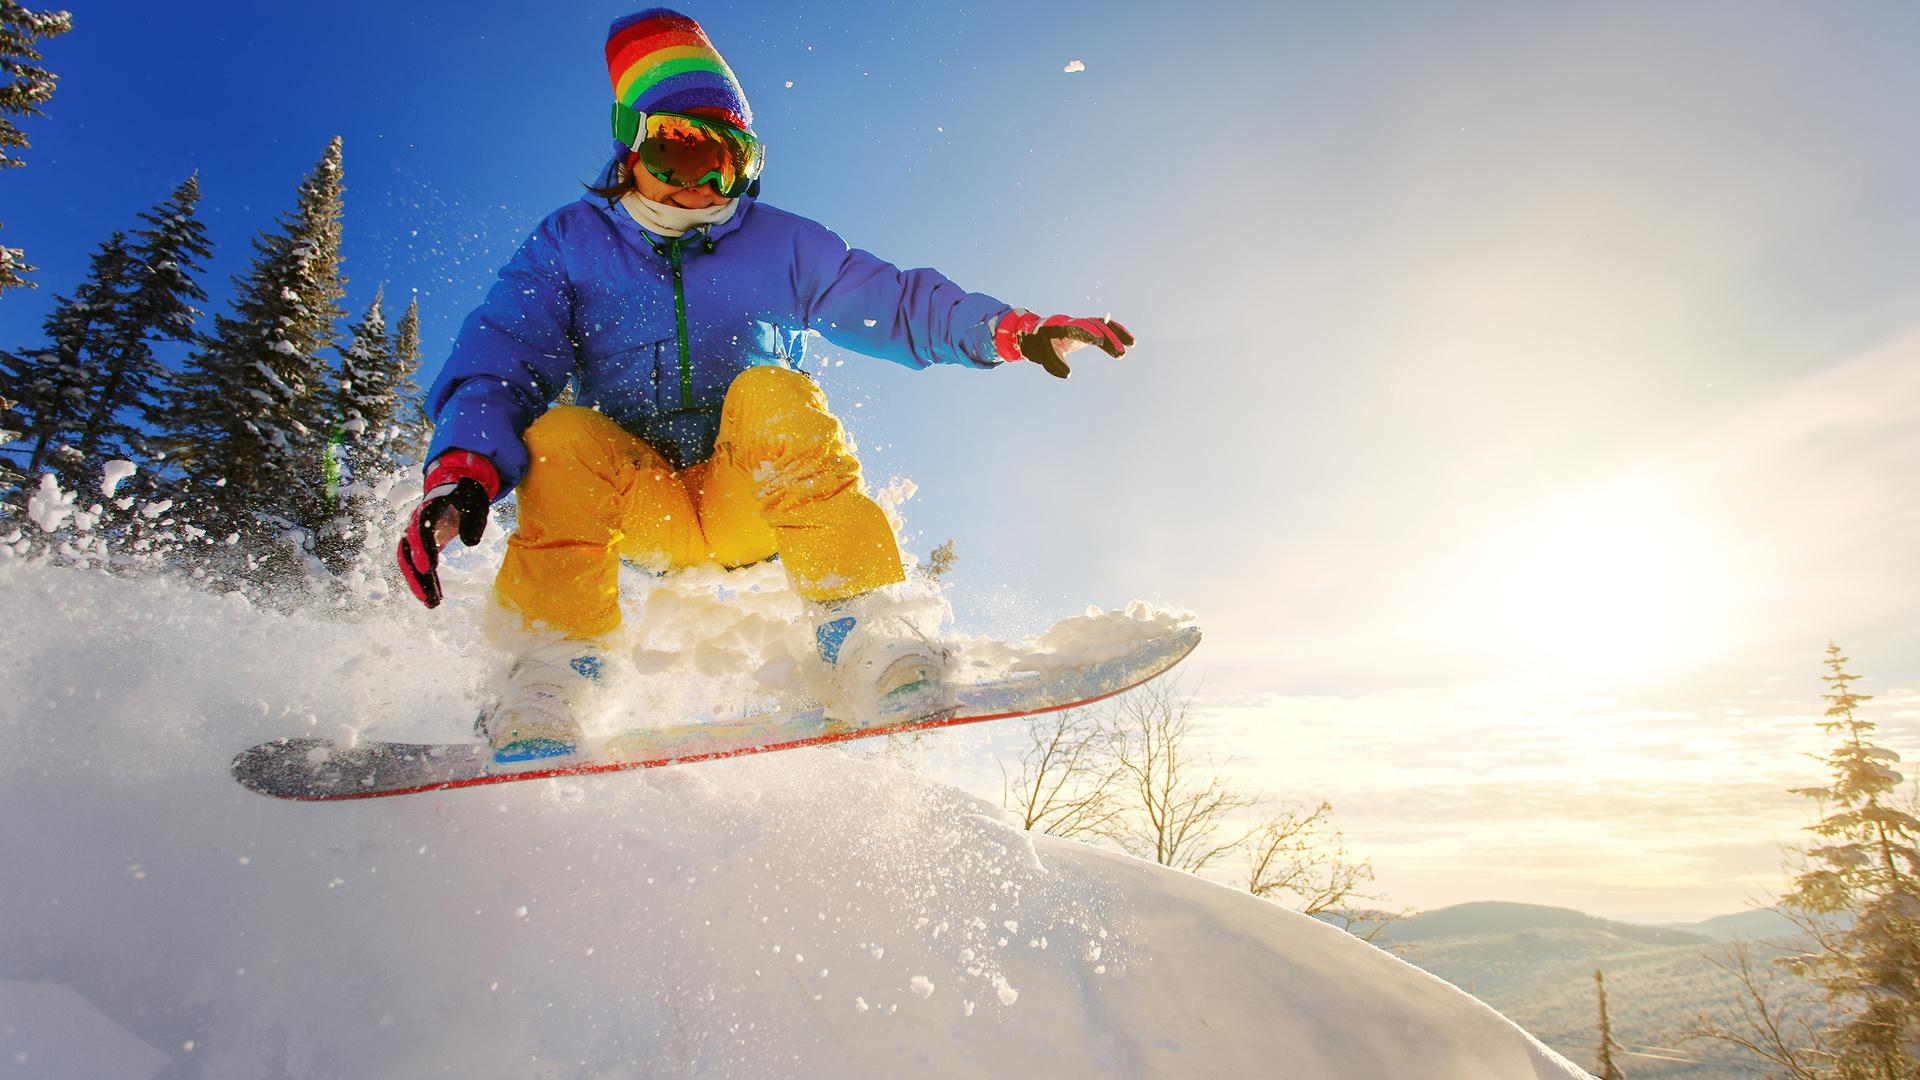 картинки про сноубордистов редко